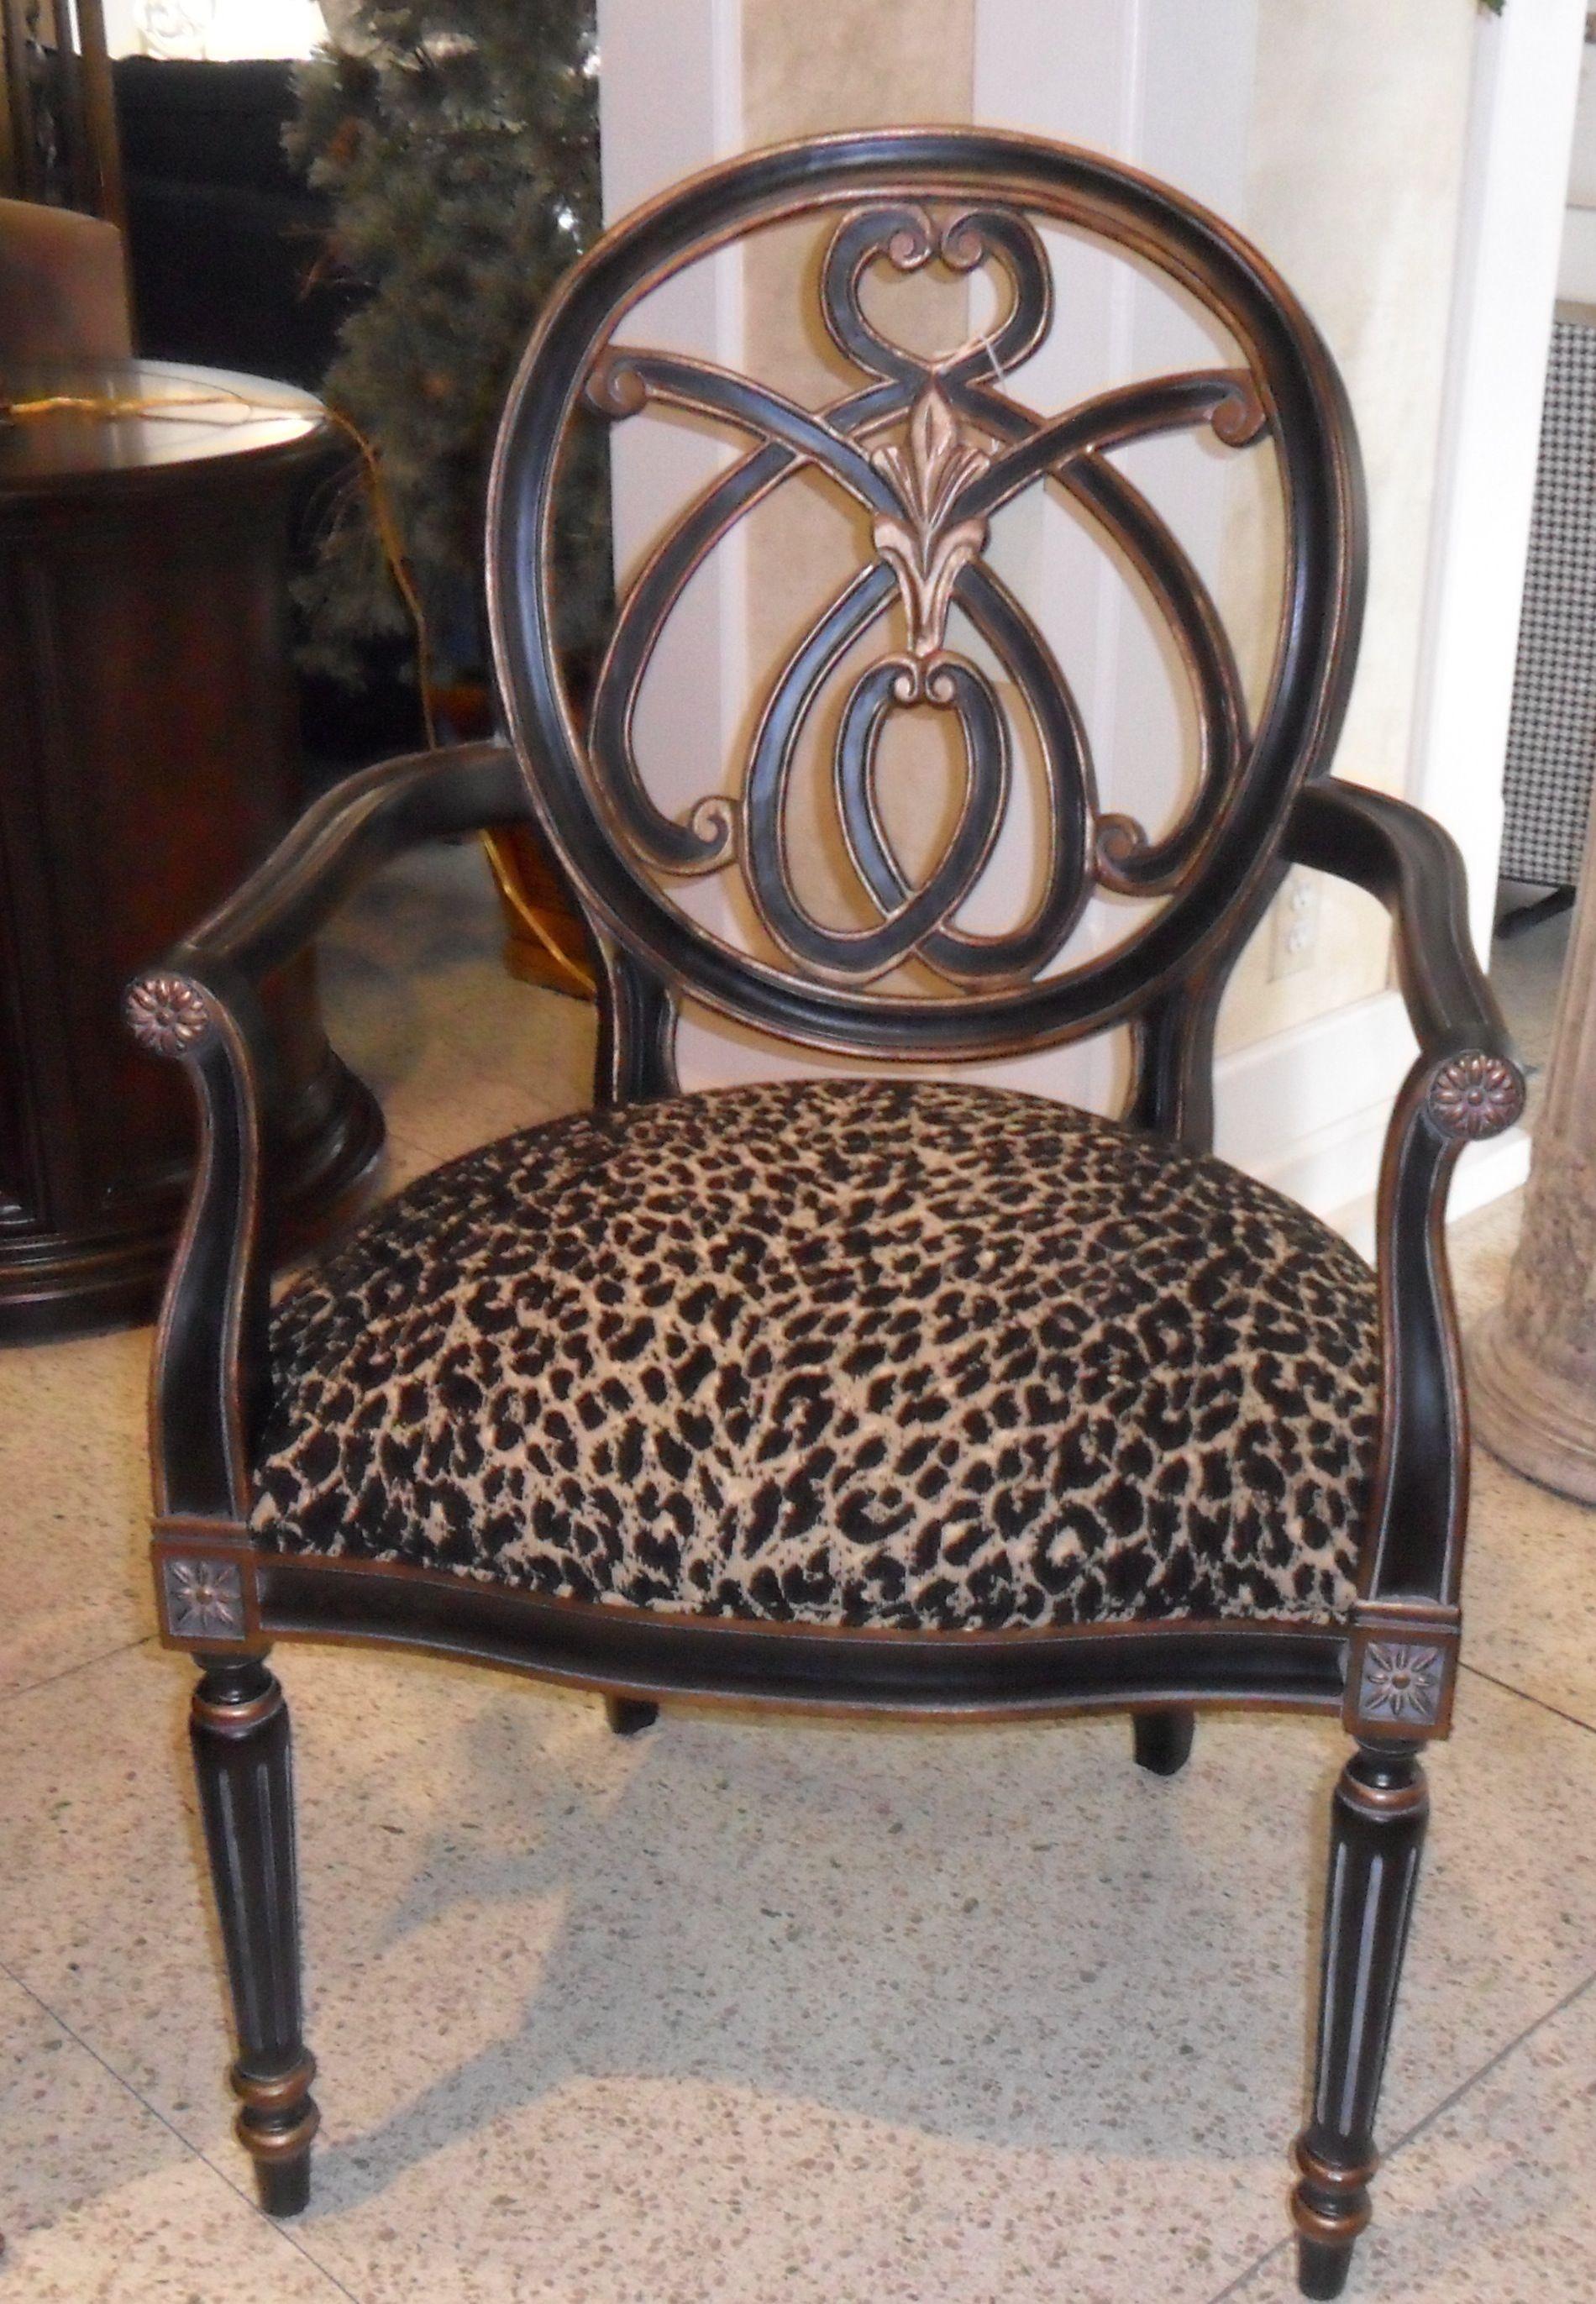 leopard print chair | Furniture | Animal print furniture ...